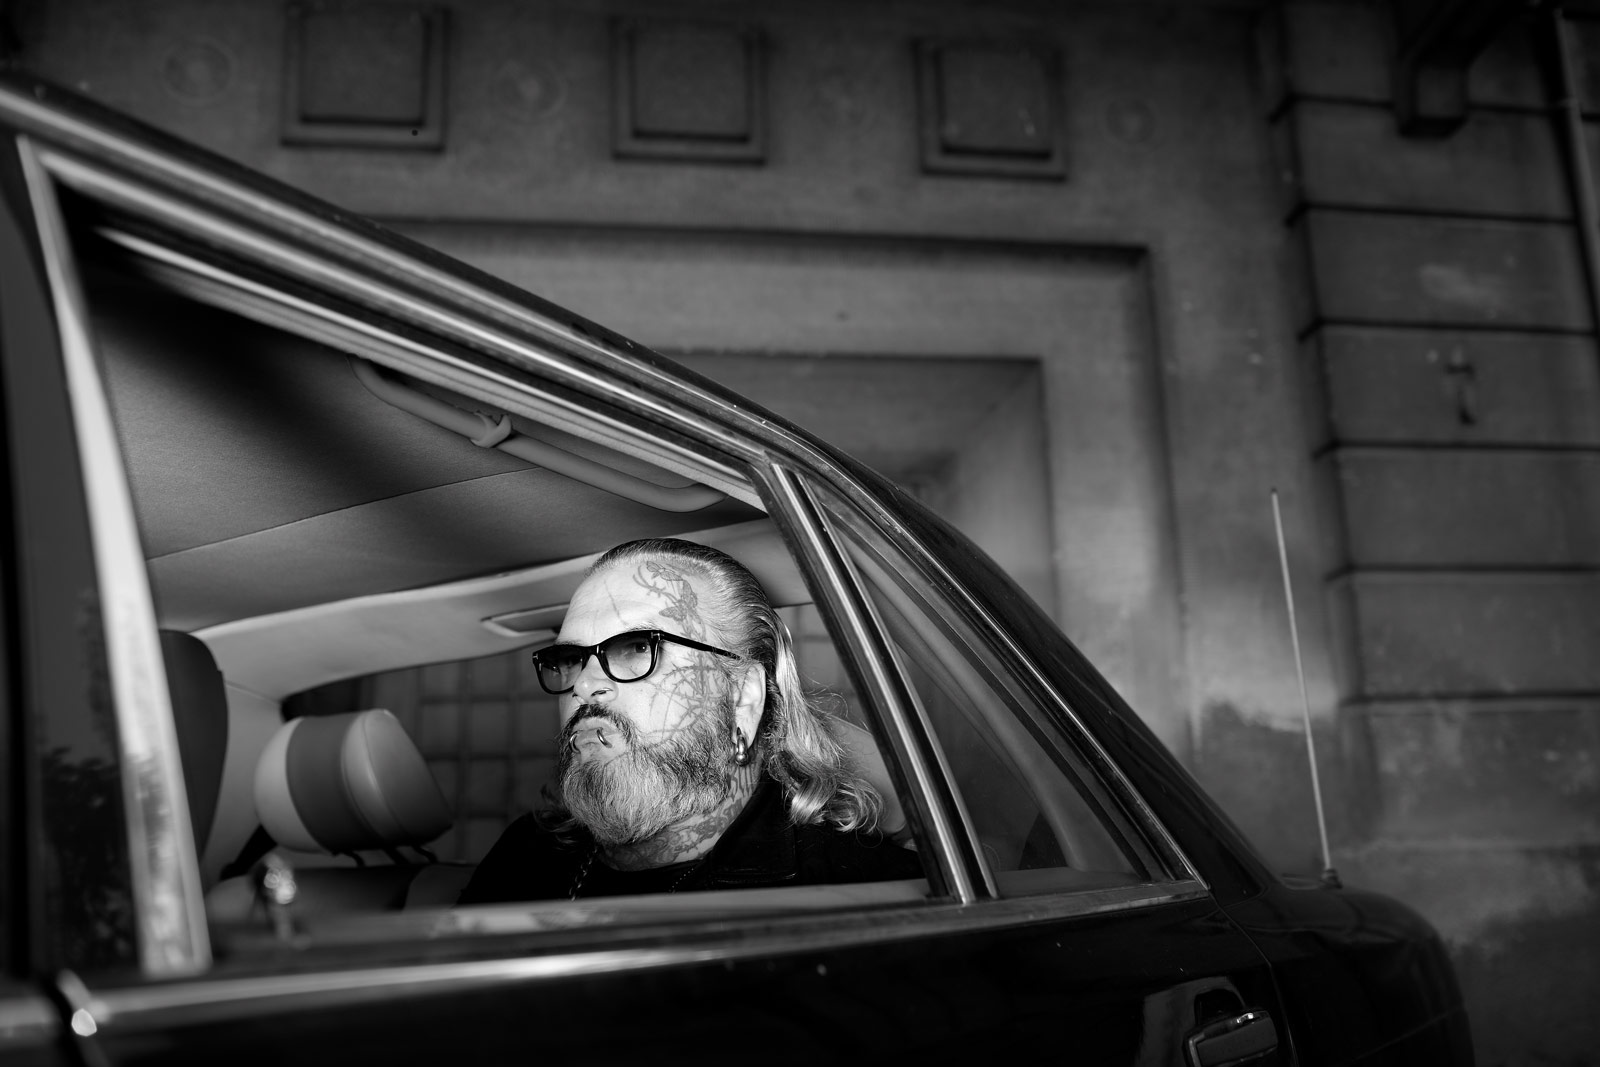 artBerlin / Sven Marquardt